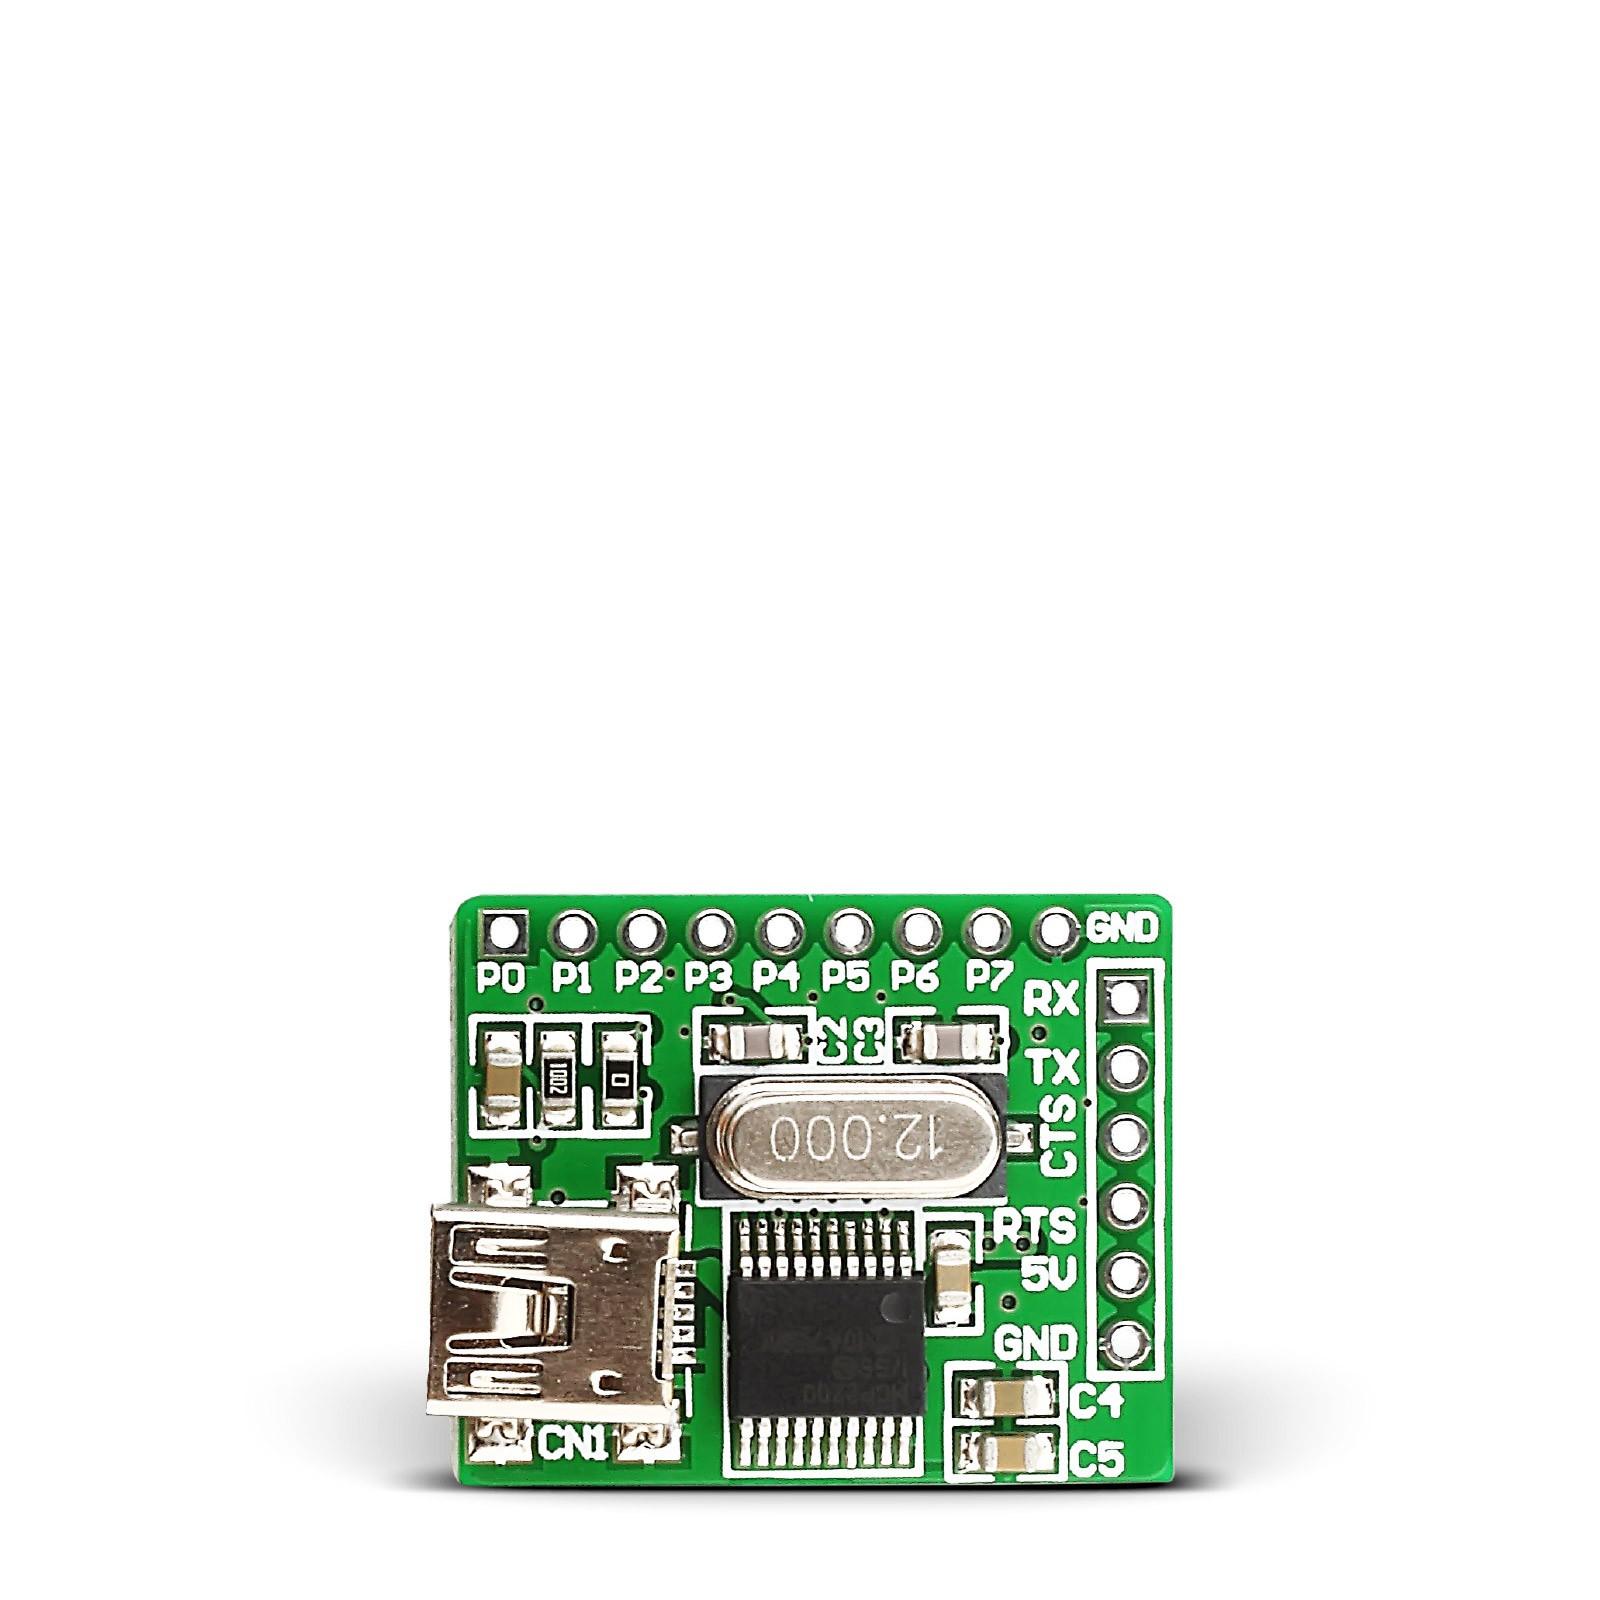 USB UART 2 Board - MCP2200 USB to Serial adapter board